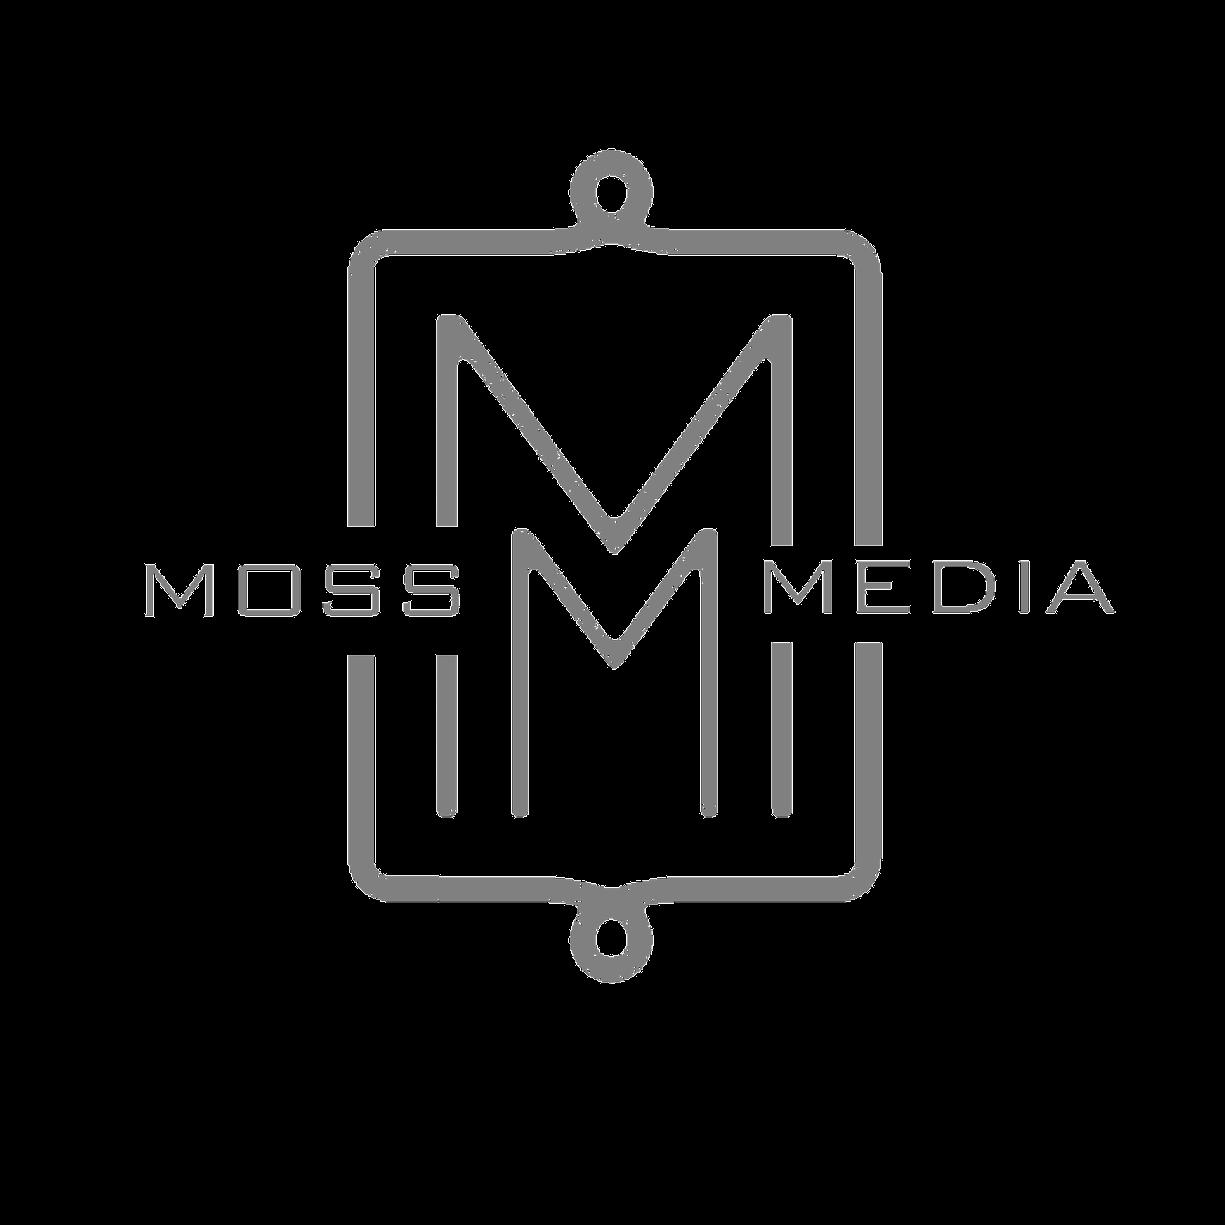 Moss Media Carmel